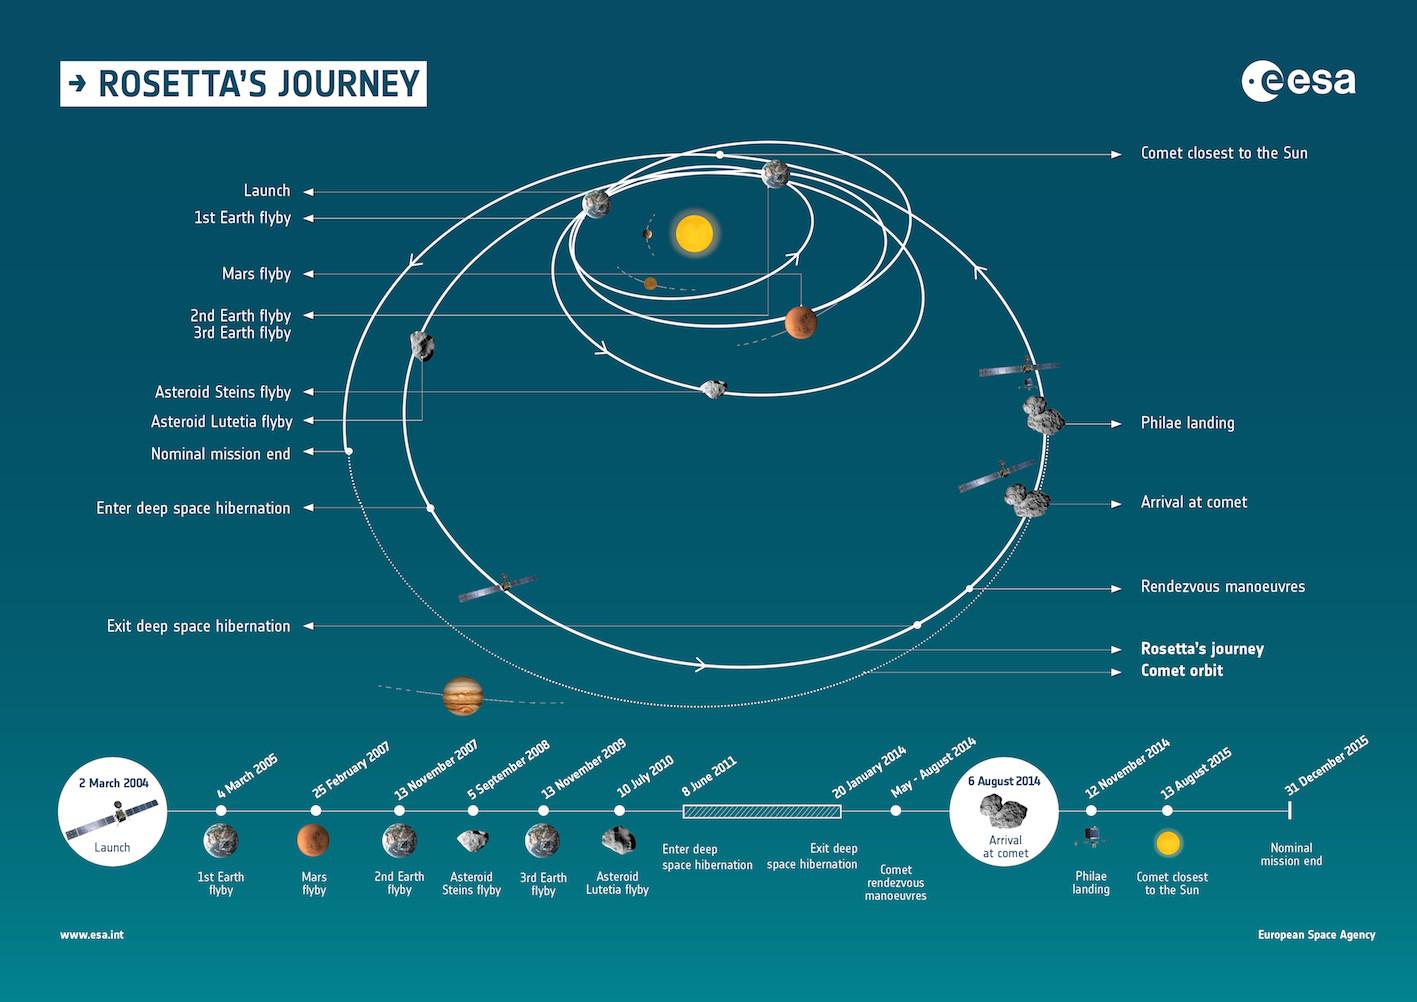 L'incroyable périple de la sonde Rosetta - 2